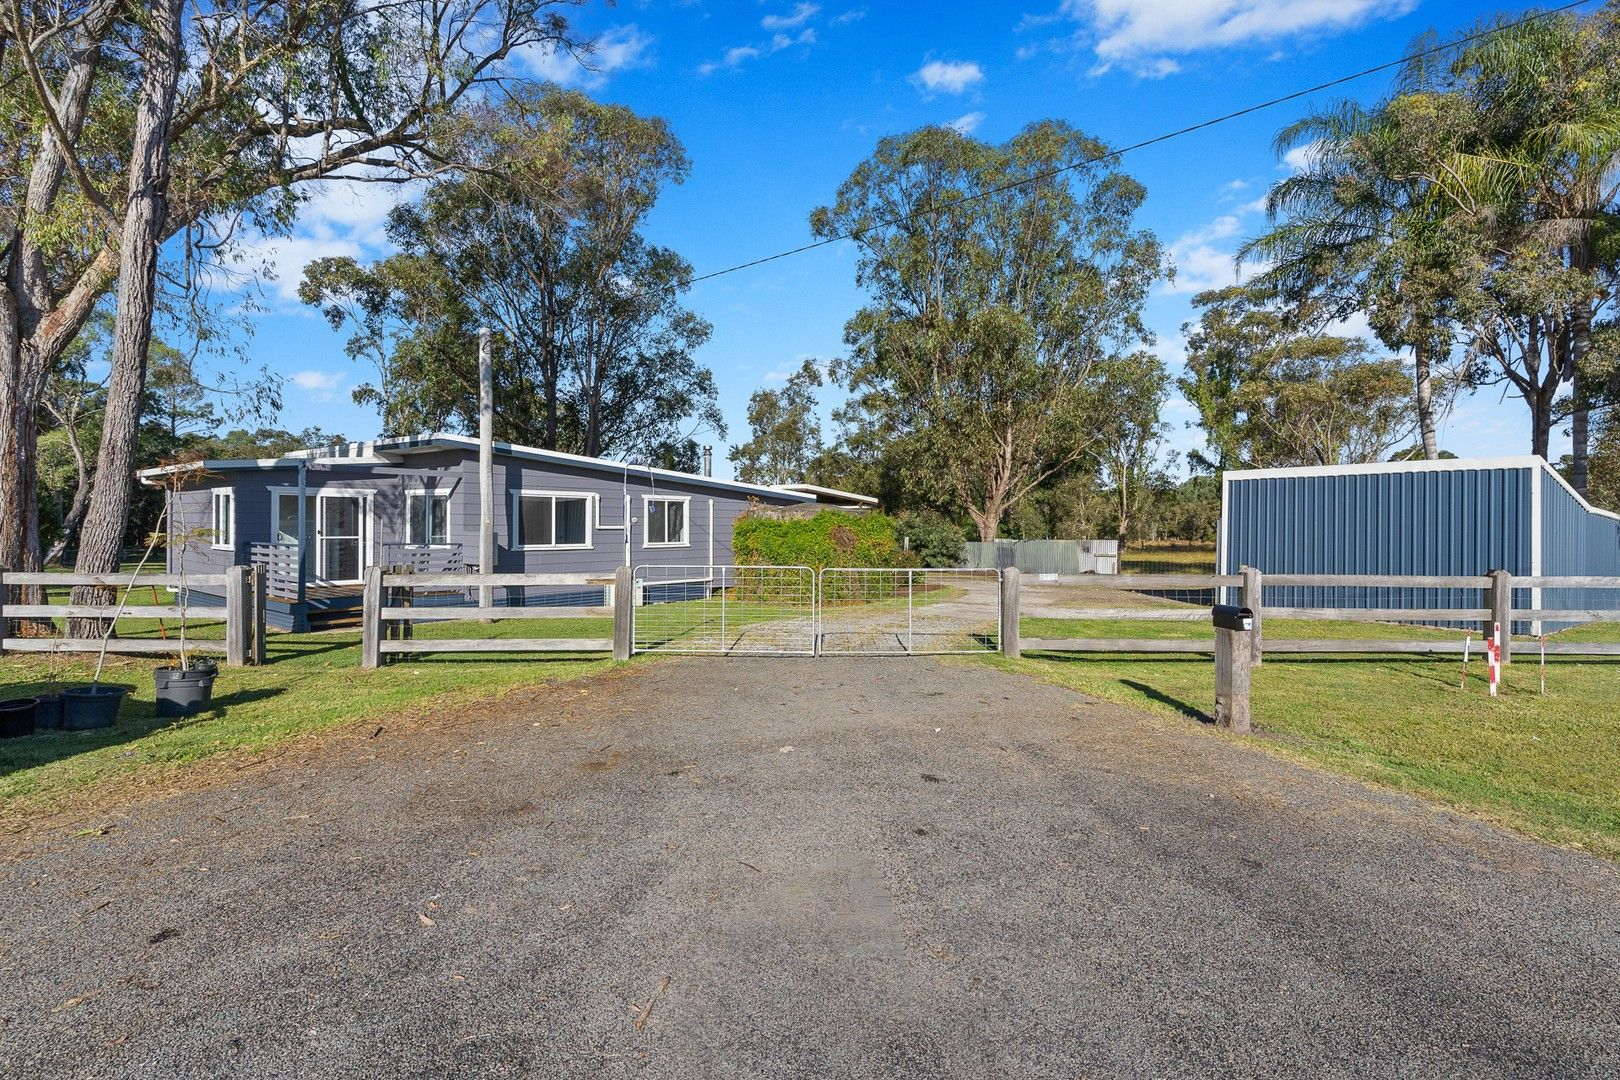 8770 Pacific Highway, Woodburn NSW 2472, Image 0